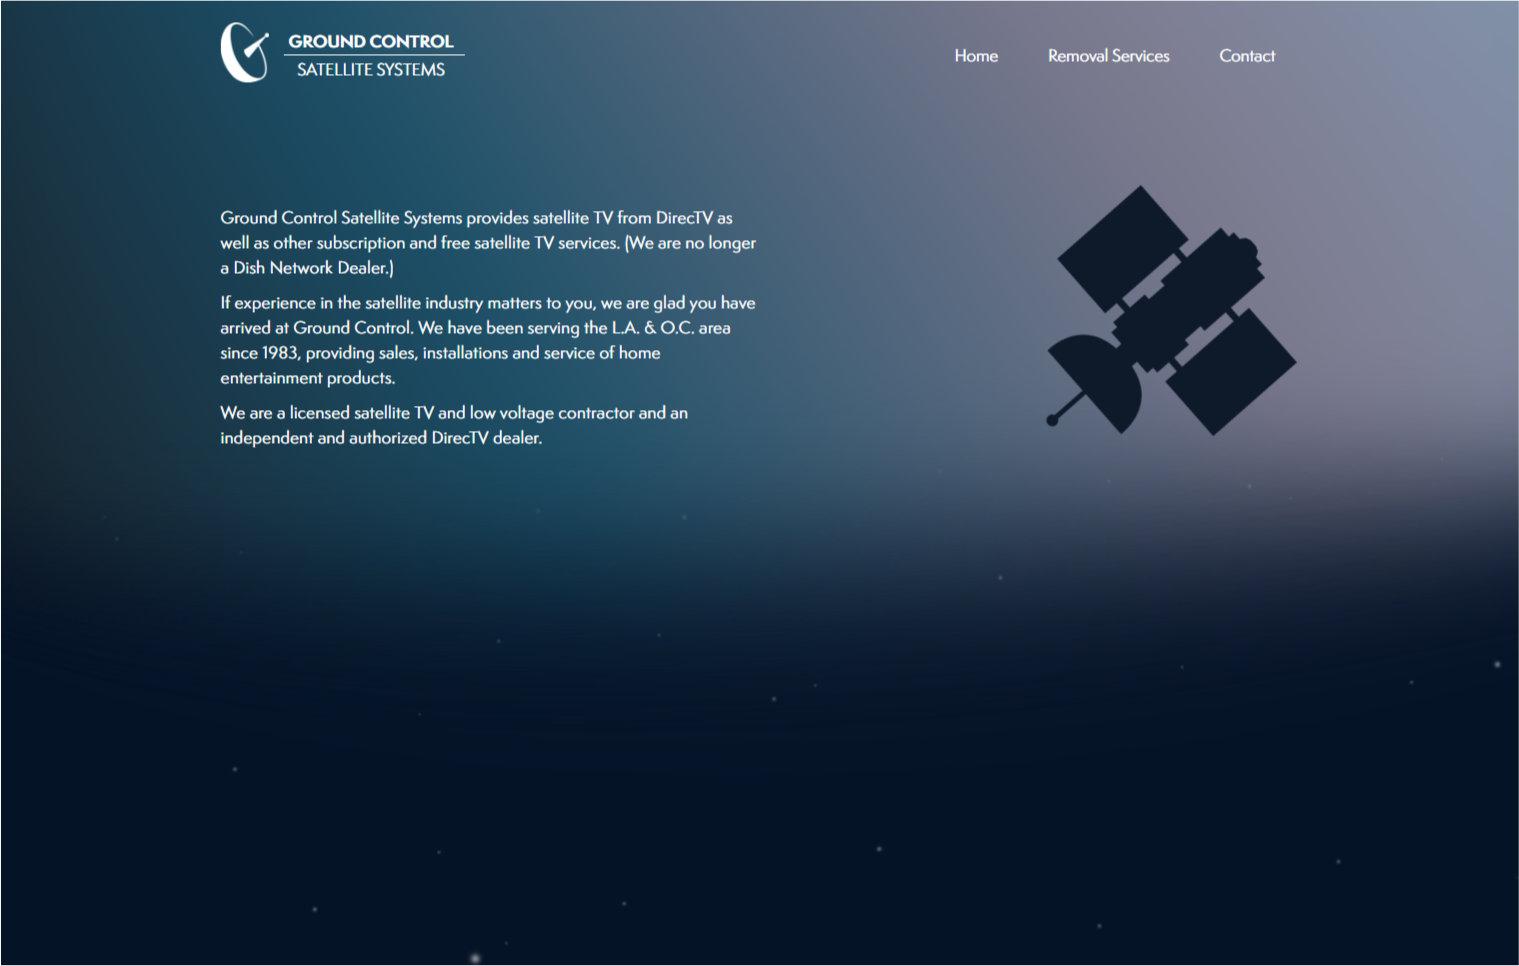 Ground Control Satellites